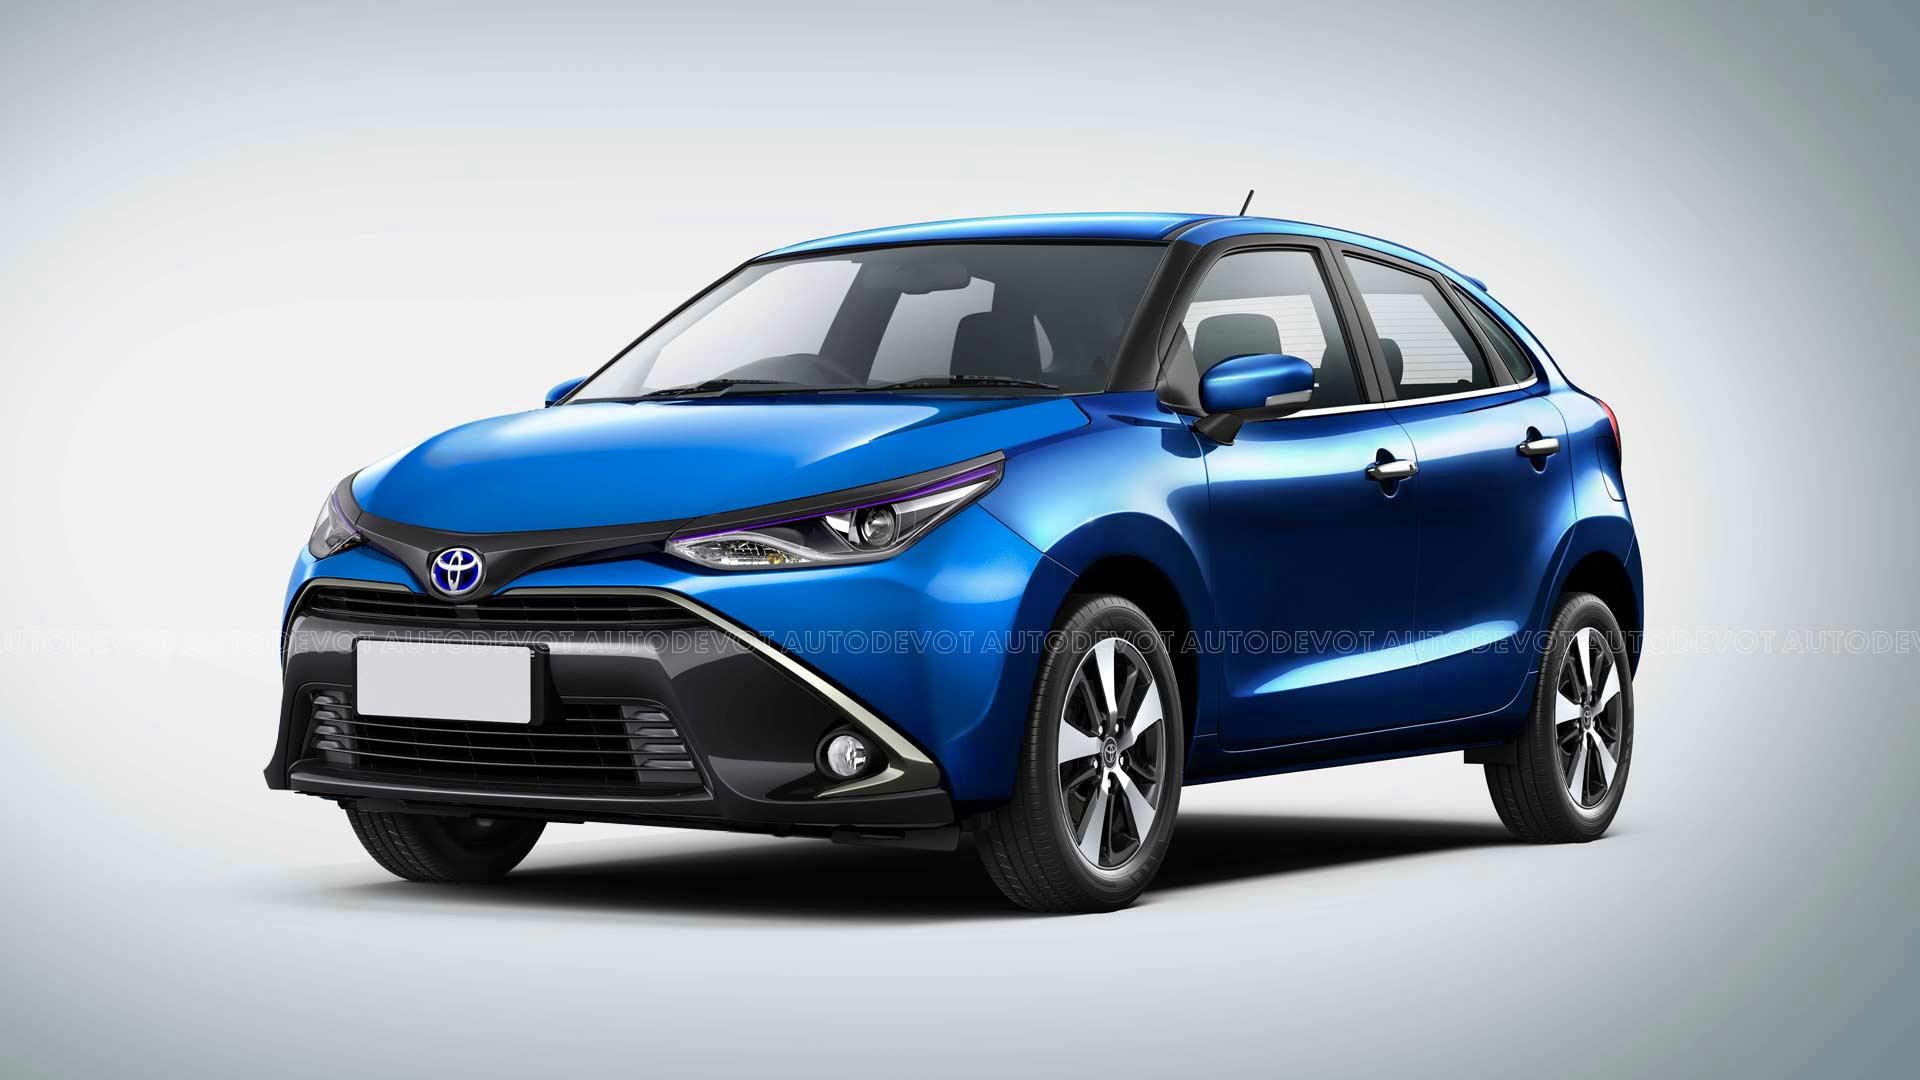 Kelebihan Kekurangan Toyota Suzuki Top Model Tahun Ini